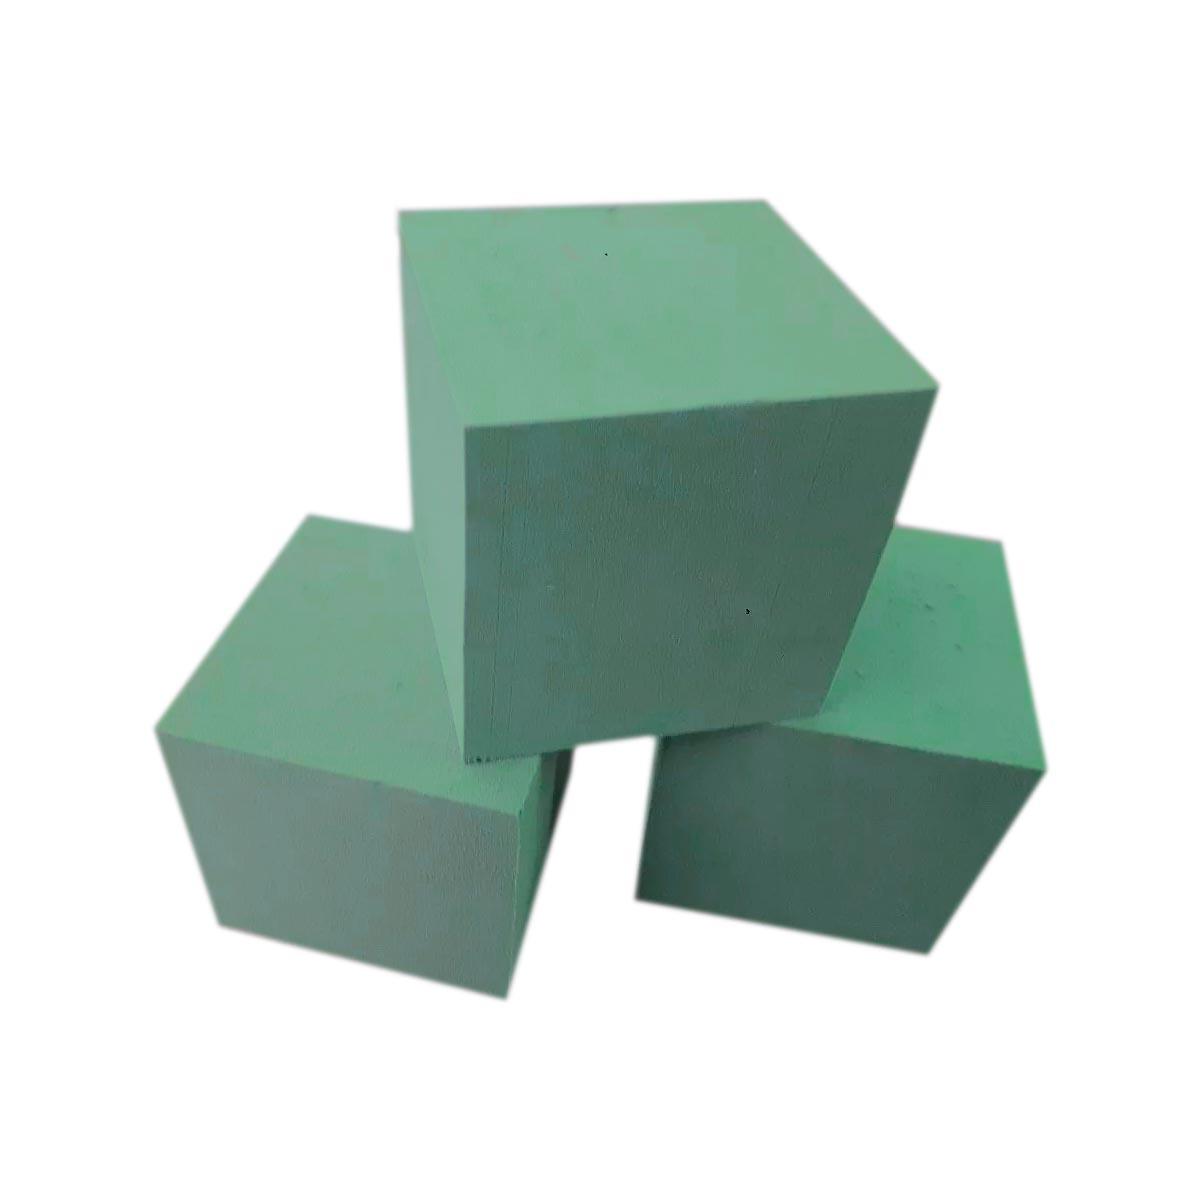 BLOCO ESPUMA FLORAL T2 15,0 x 15,0 x 15,0 cm - 24 UNIDADES